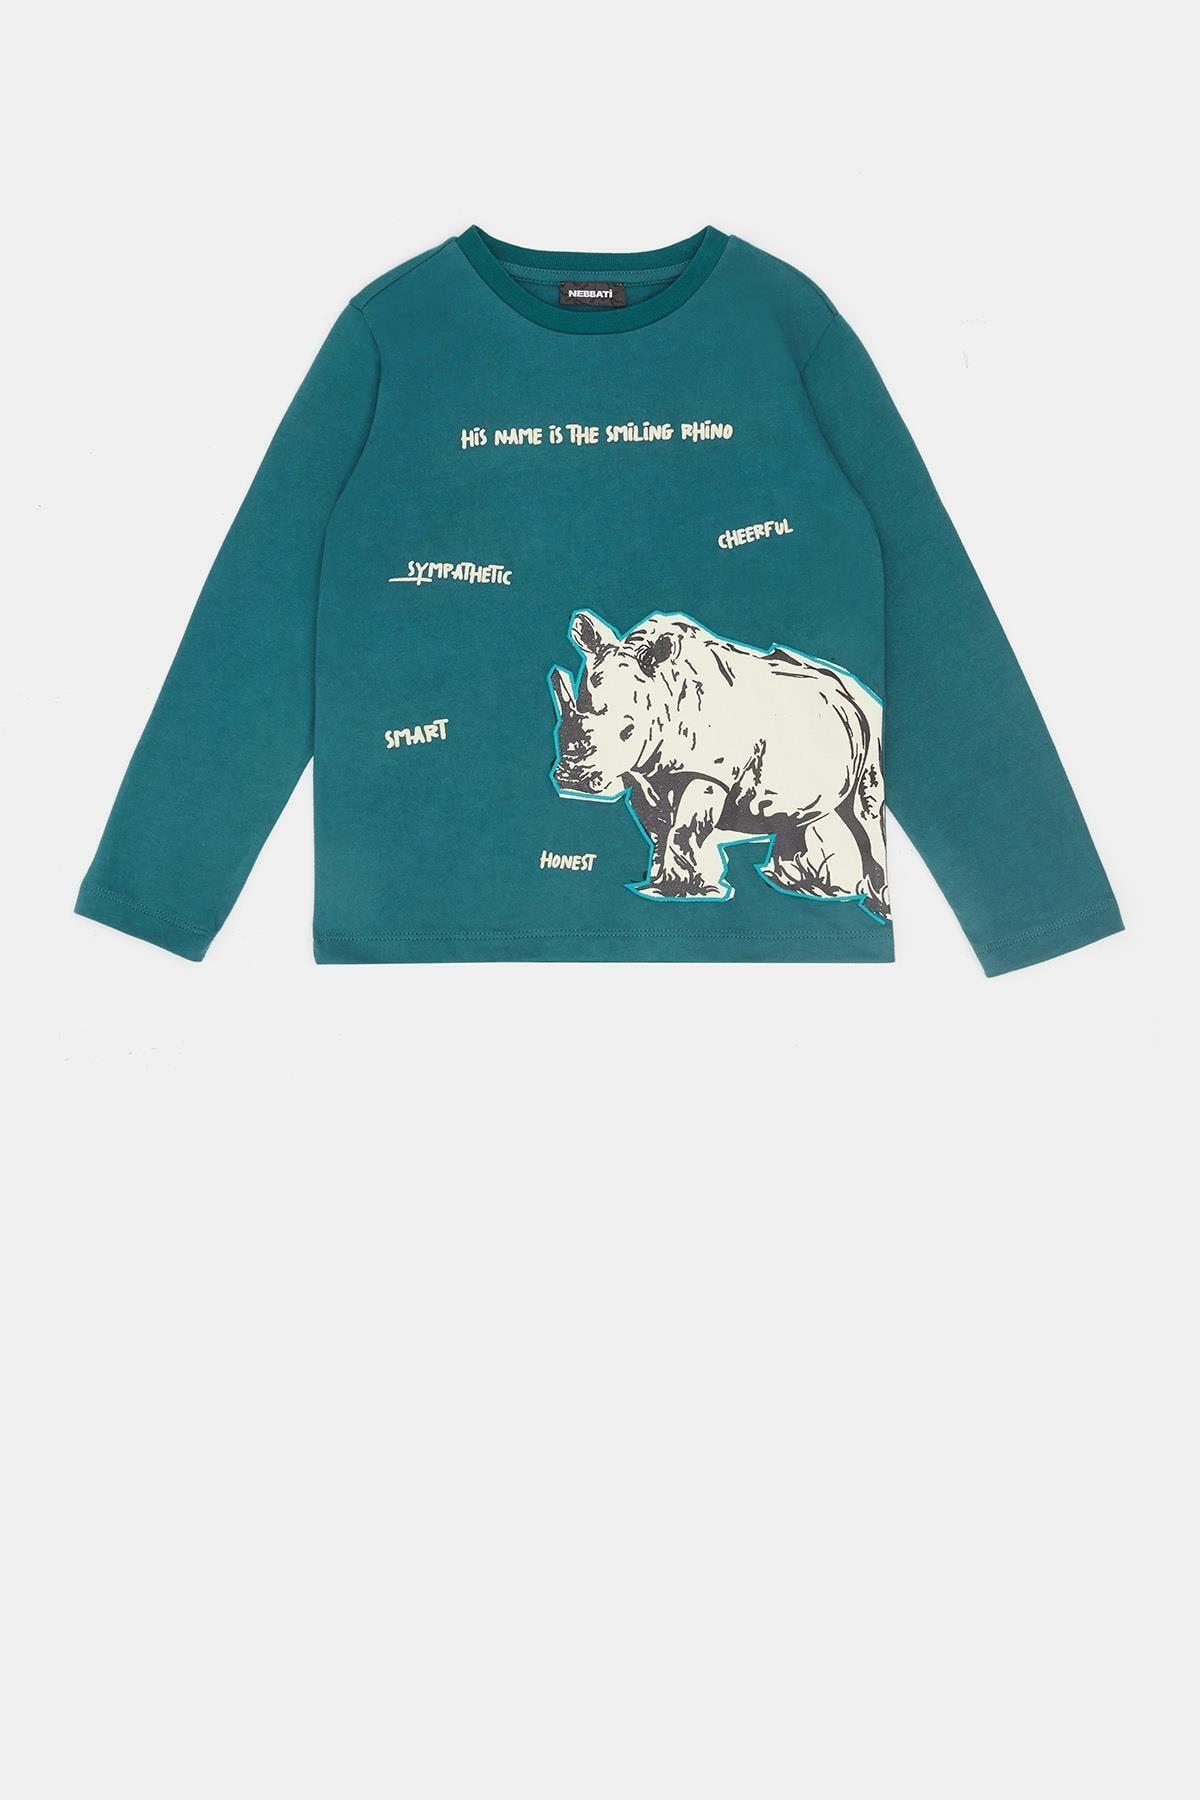 Nebbati Erkek Çocuk Yeşil T-shirt 20fw0nb3521 2